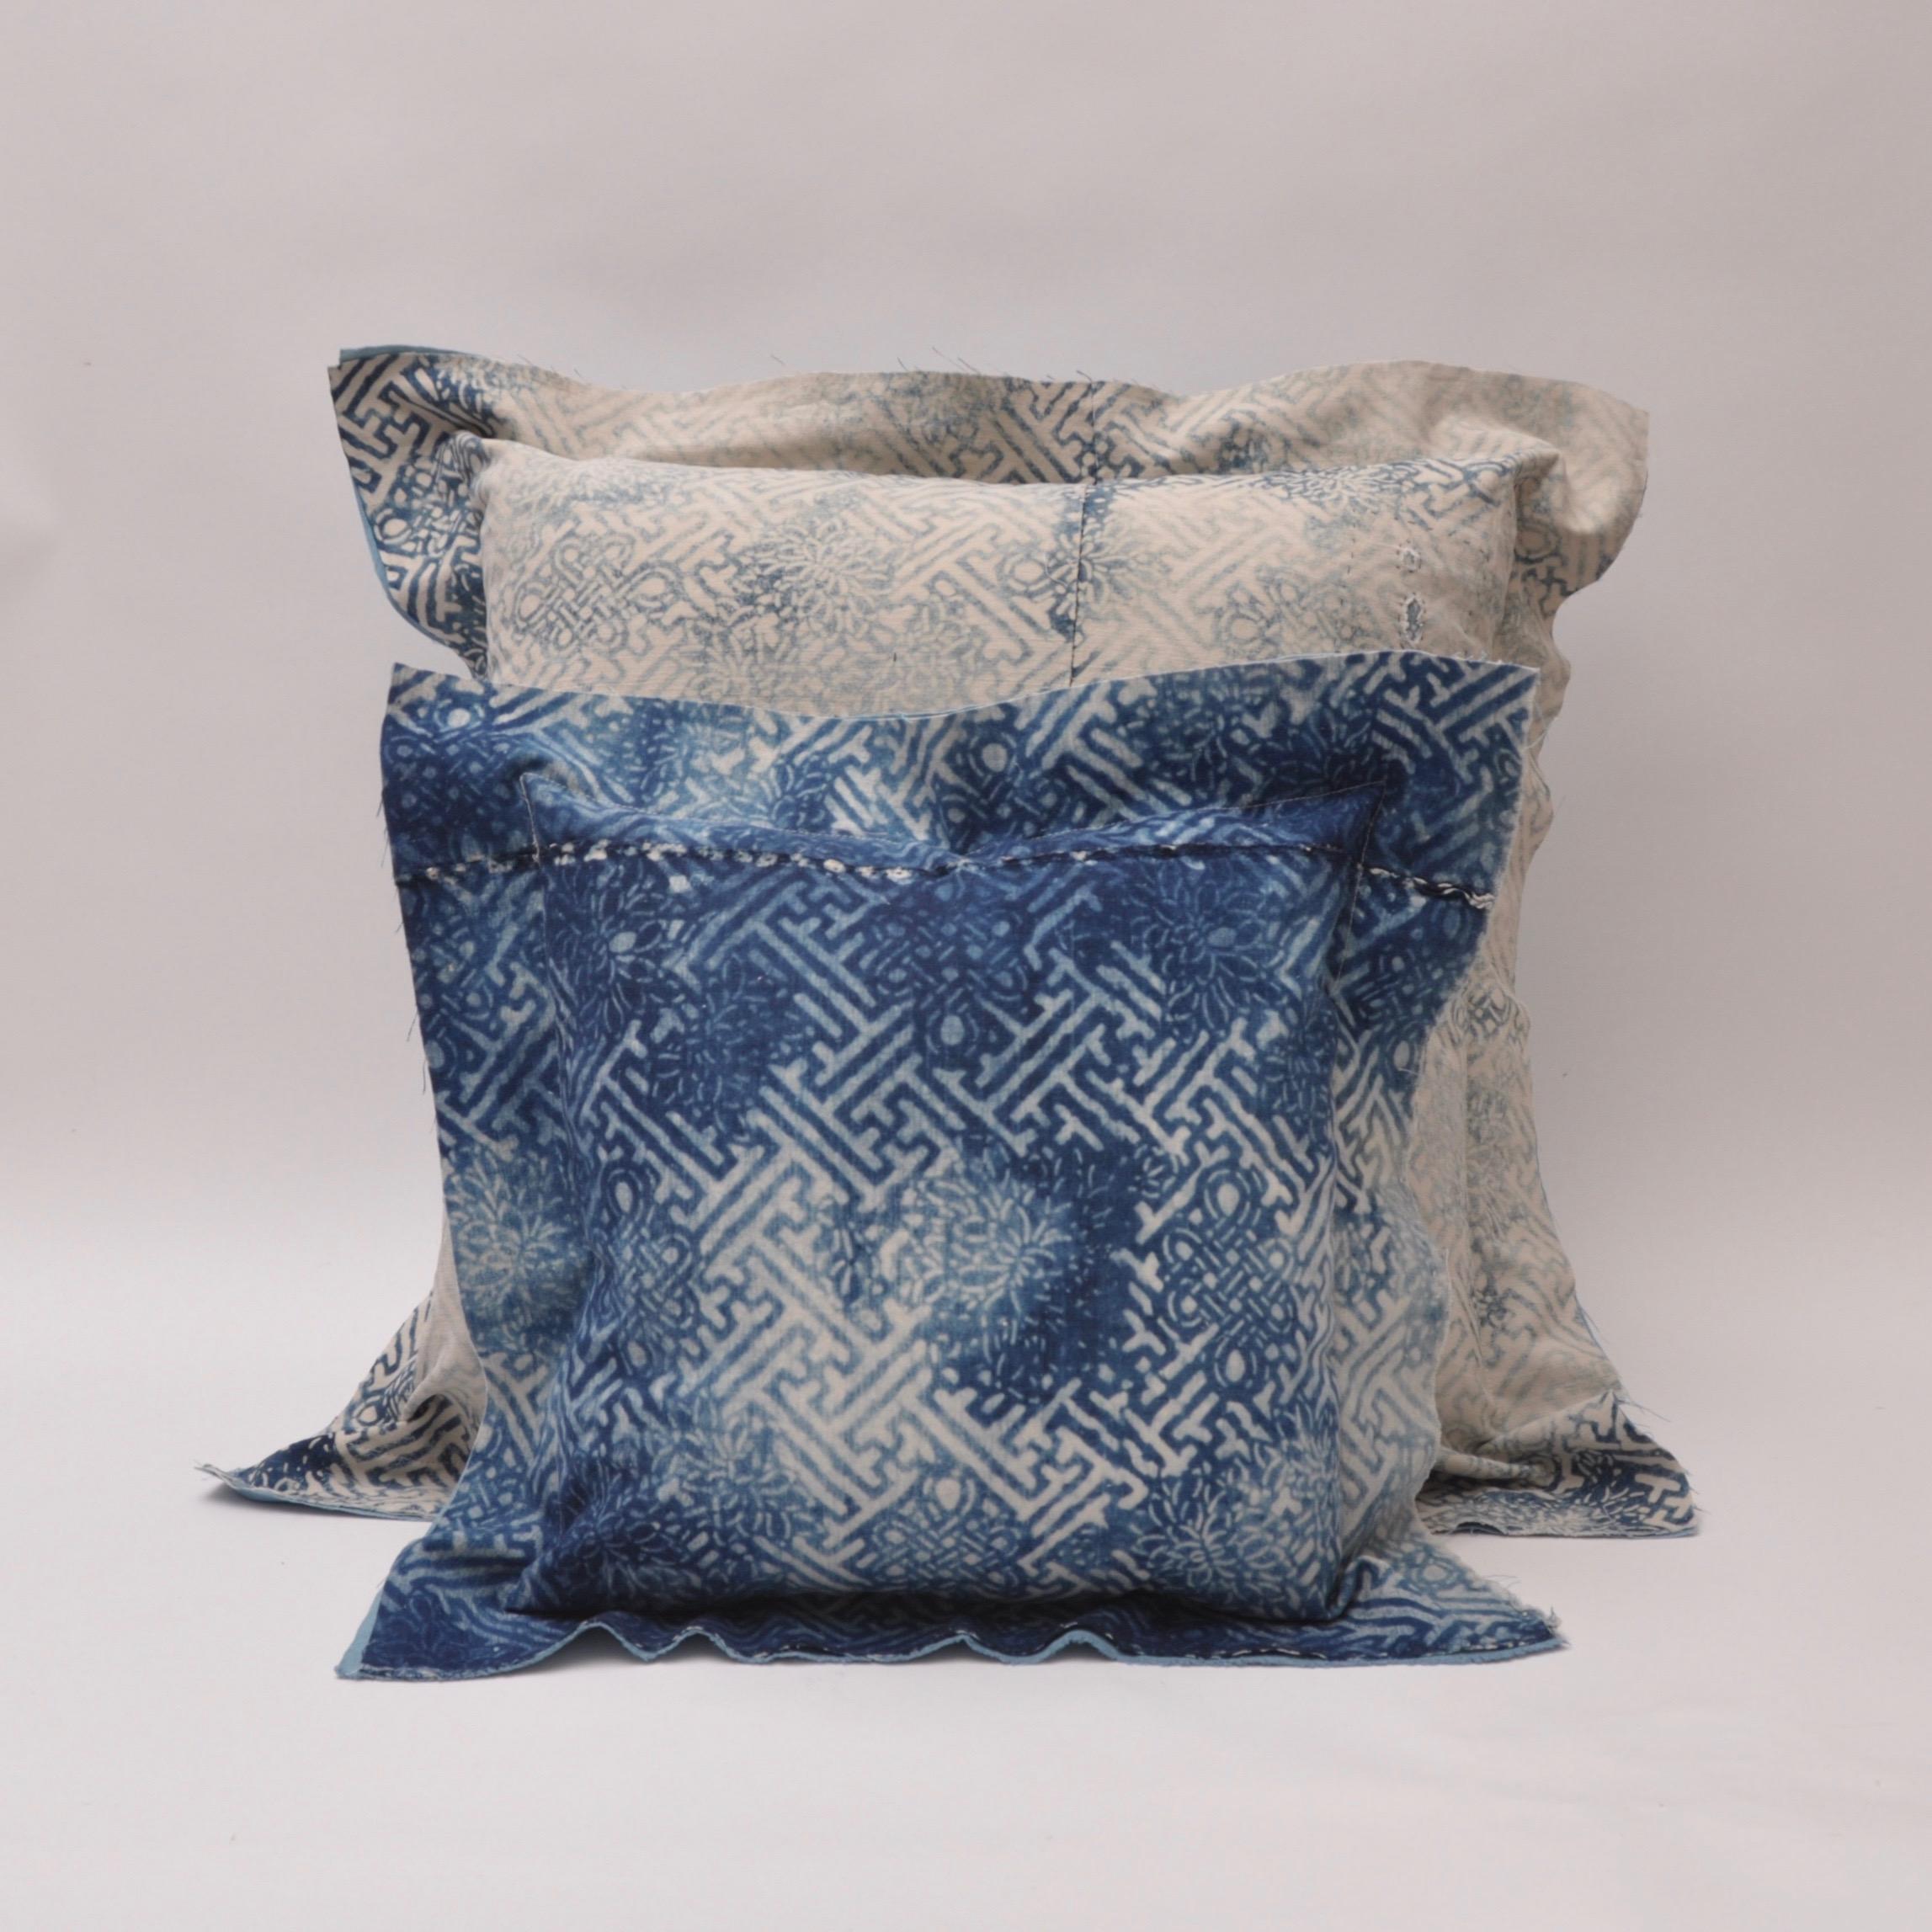 Vintage Indigo Cushion Eternal Knot Pattern Vintage Cotton Bluehanded